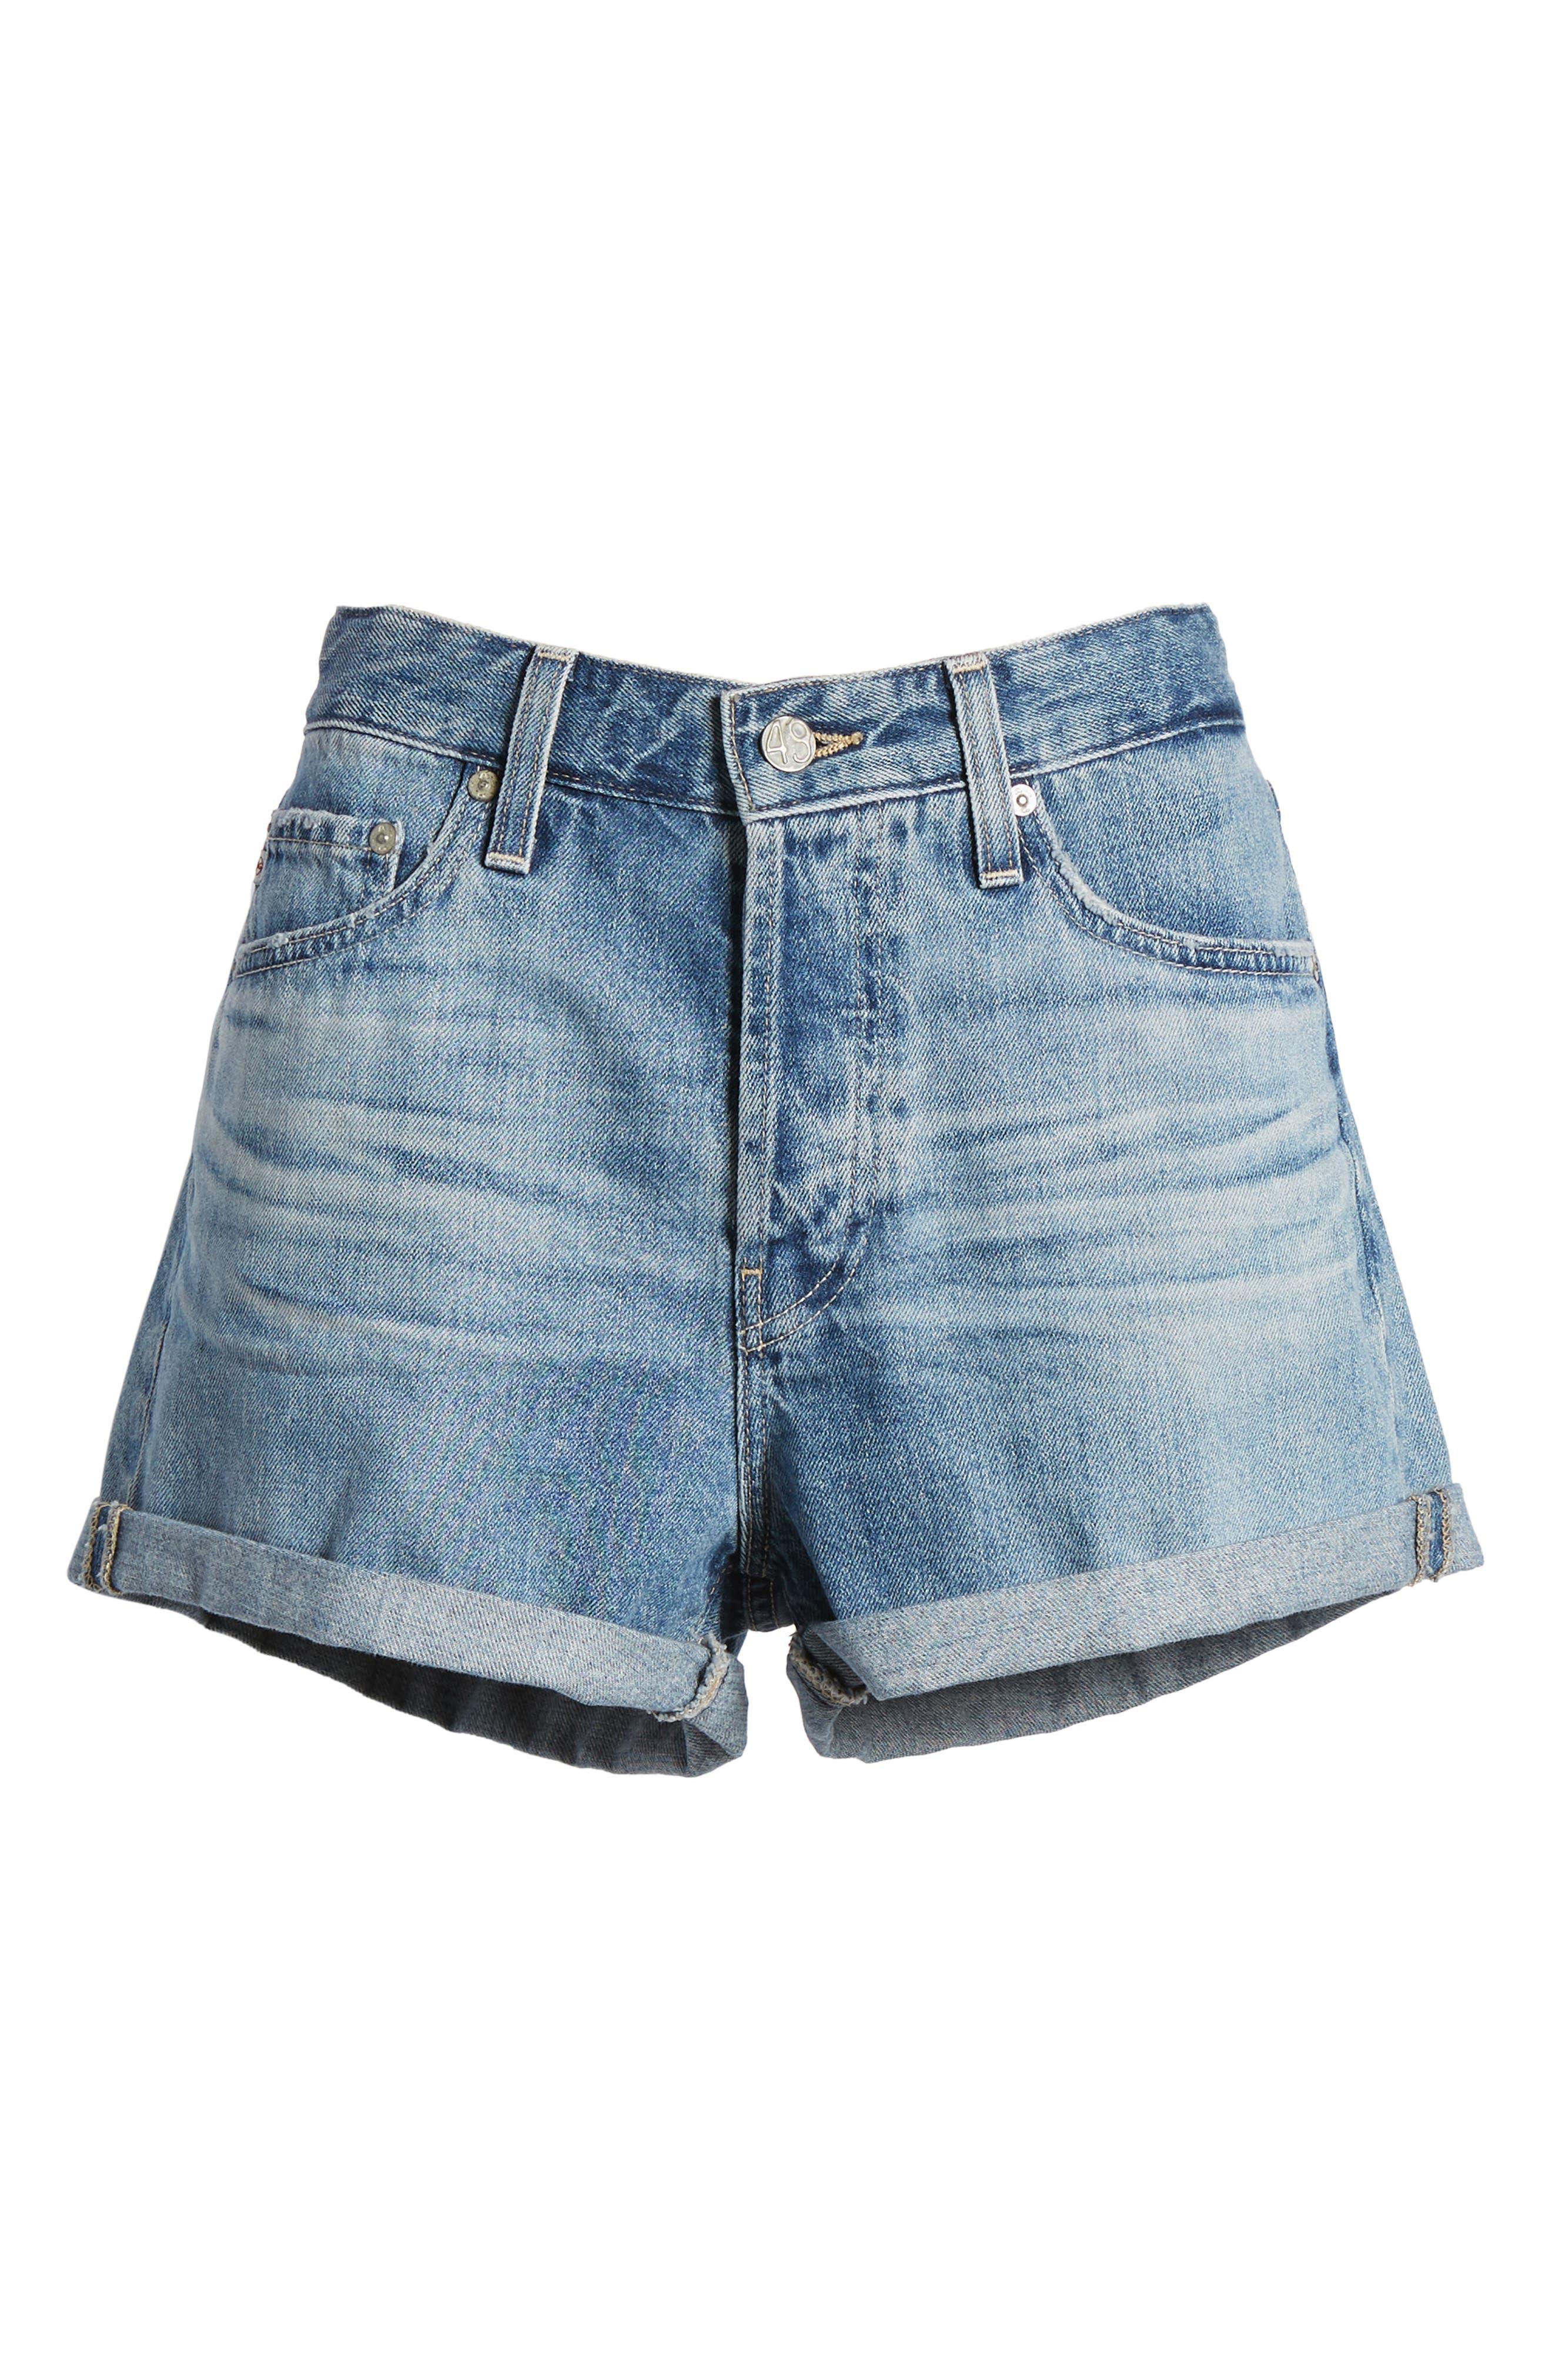 Alex Cuff Denim Boyfriend Shorts,                             Alternate thumbnail 7, color,